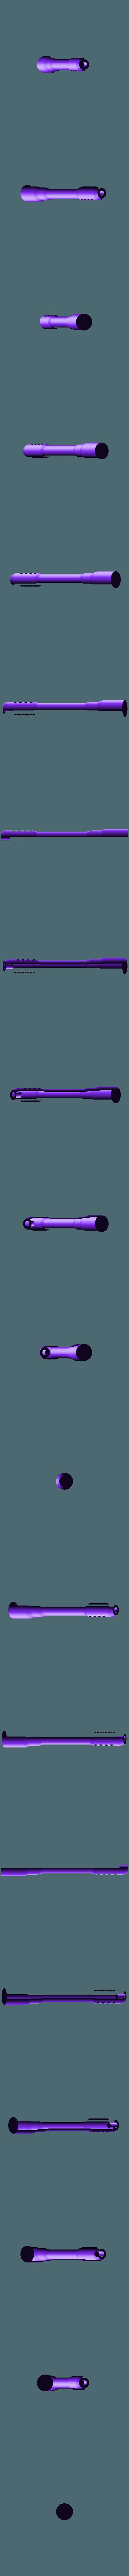 Gun_Hydra_AddOn.stl Download free STL file Interstellar Army - Quad Mortar and Quad Cannon • 3D printing model, Cikkirock